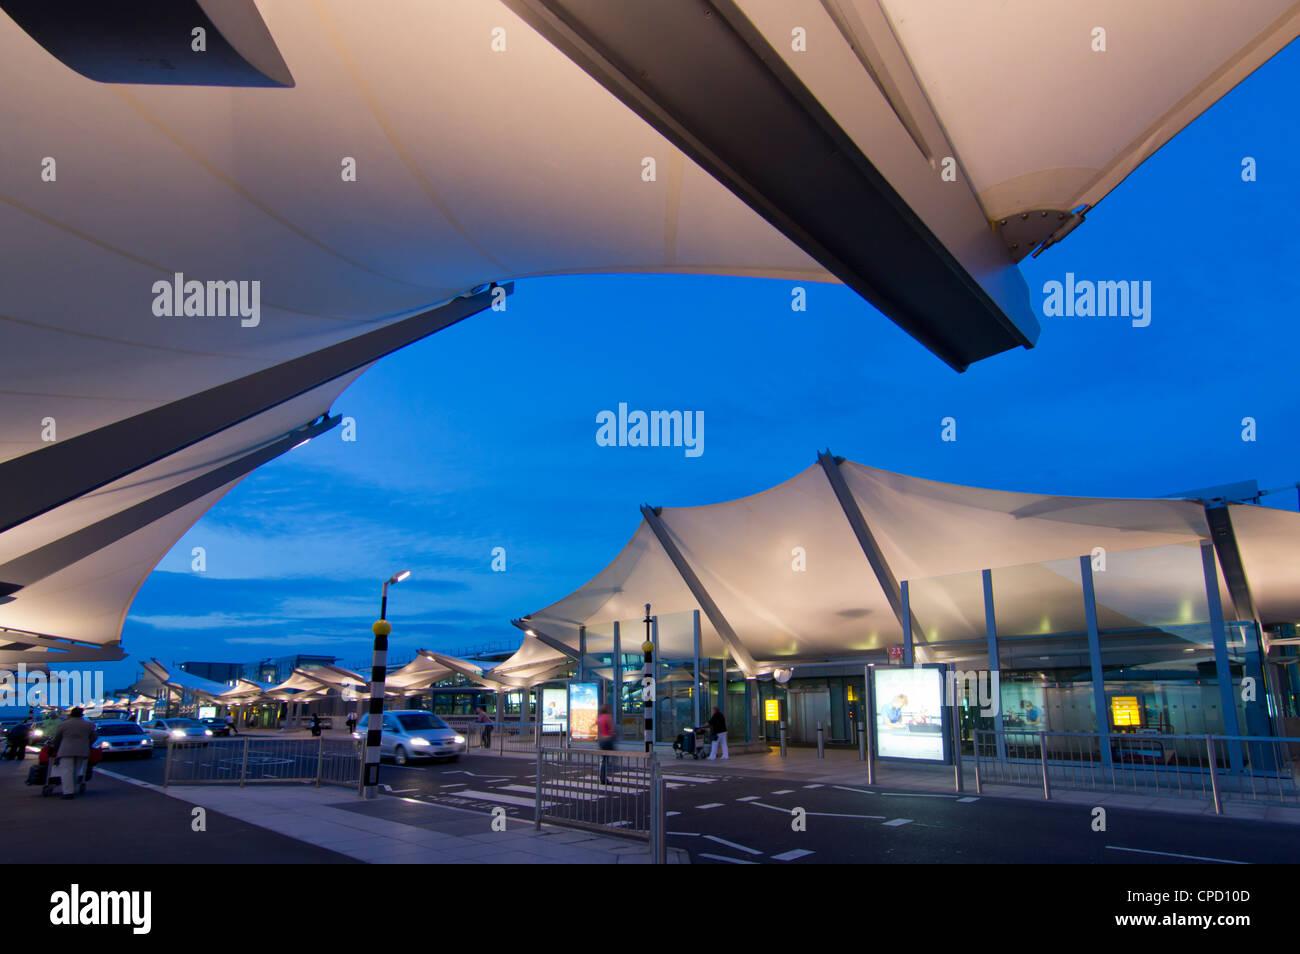 Heathrow Airport Terminal 5 at dusk, London, England, United Kingdom, Europe - Stock Image